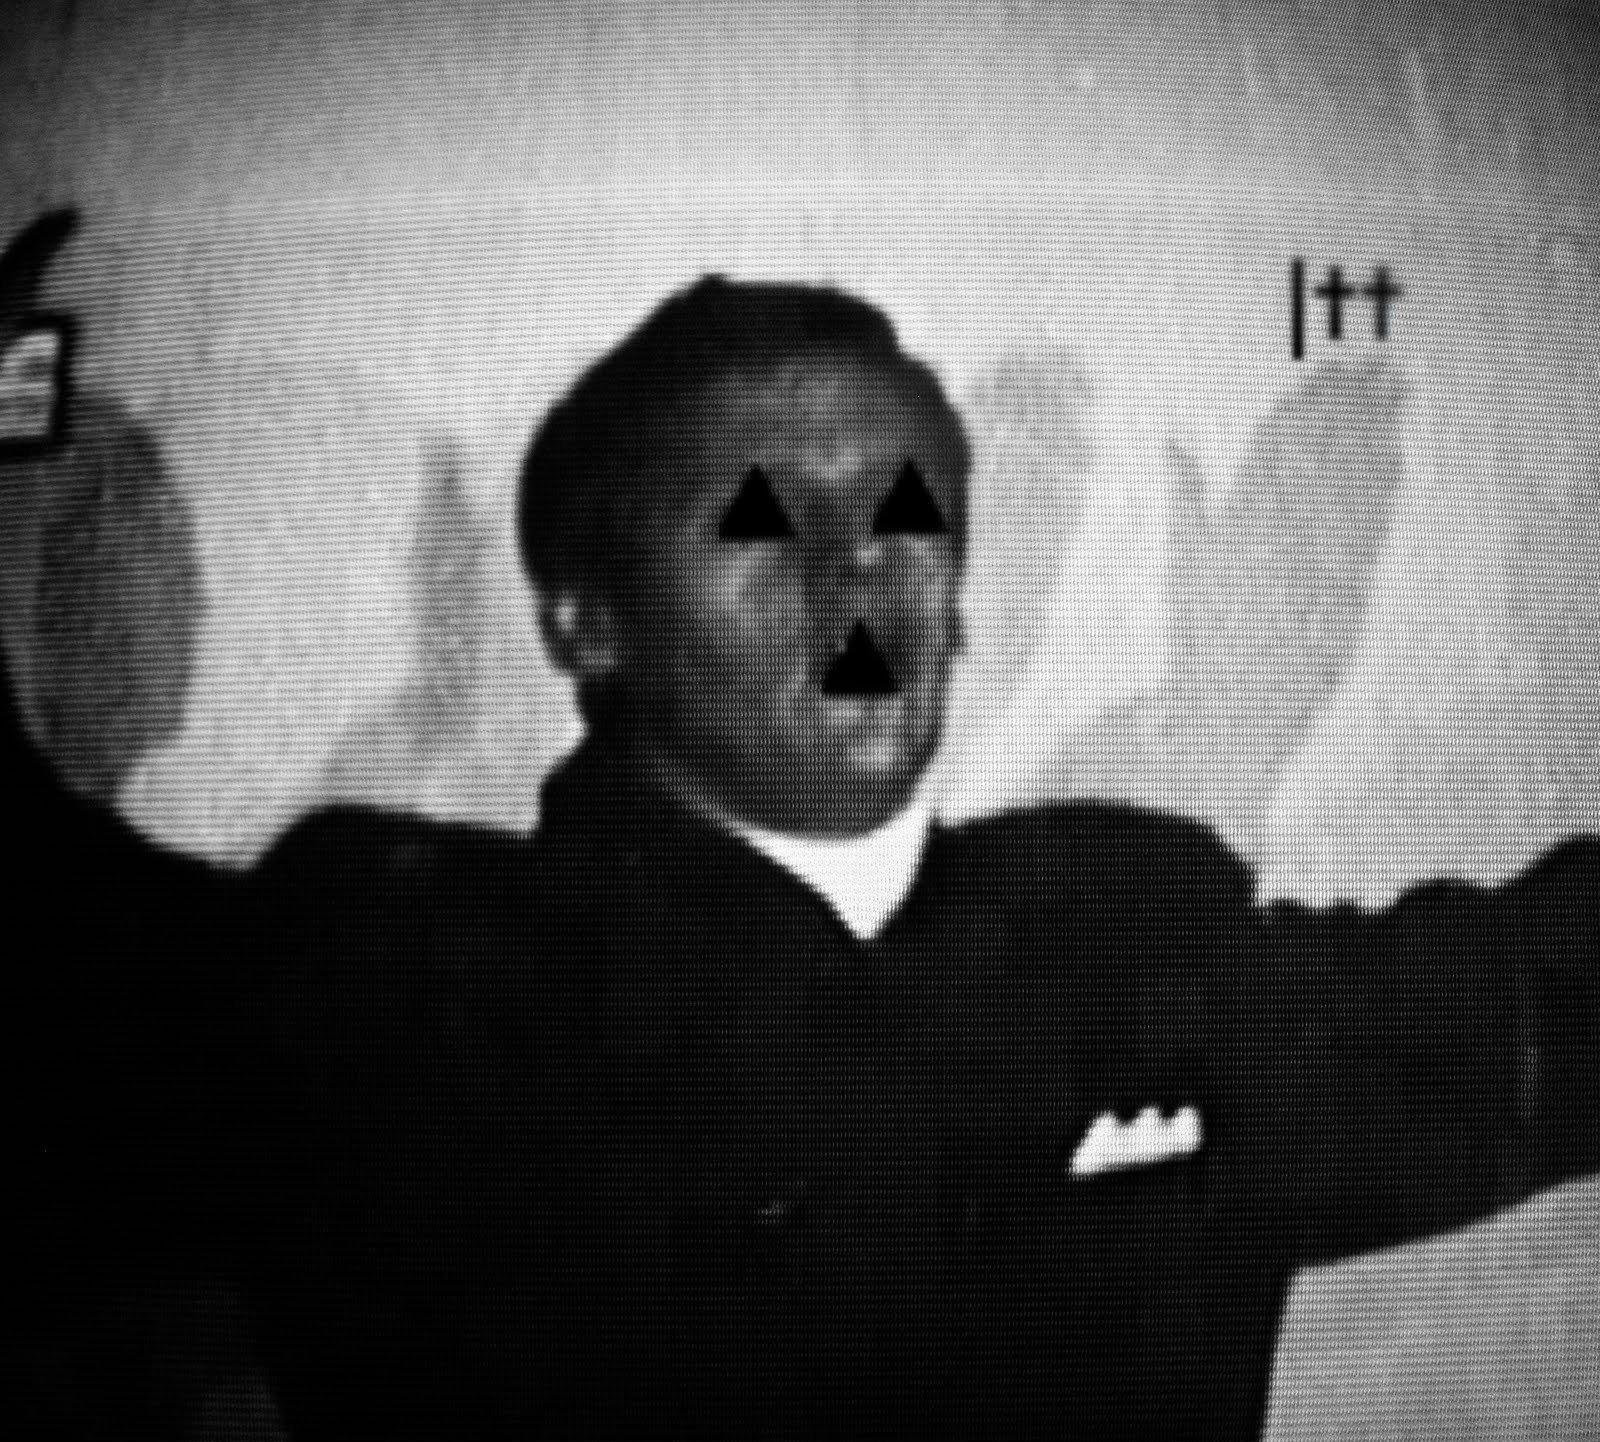 Wallpaper 1600x1442 Px Dark Evil Occult Satan Satanic